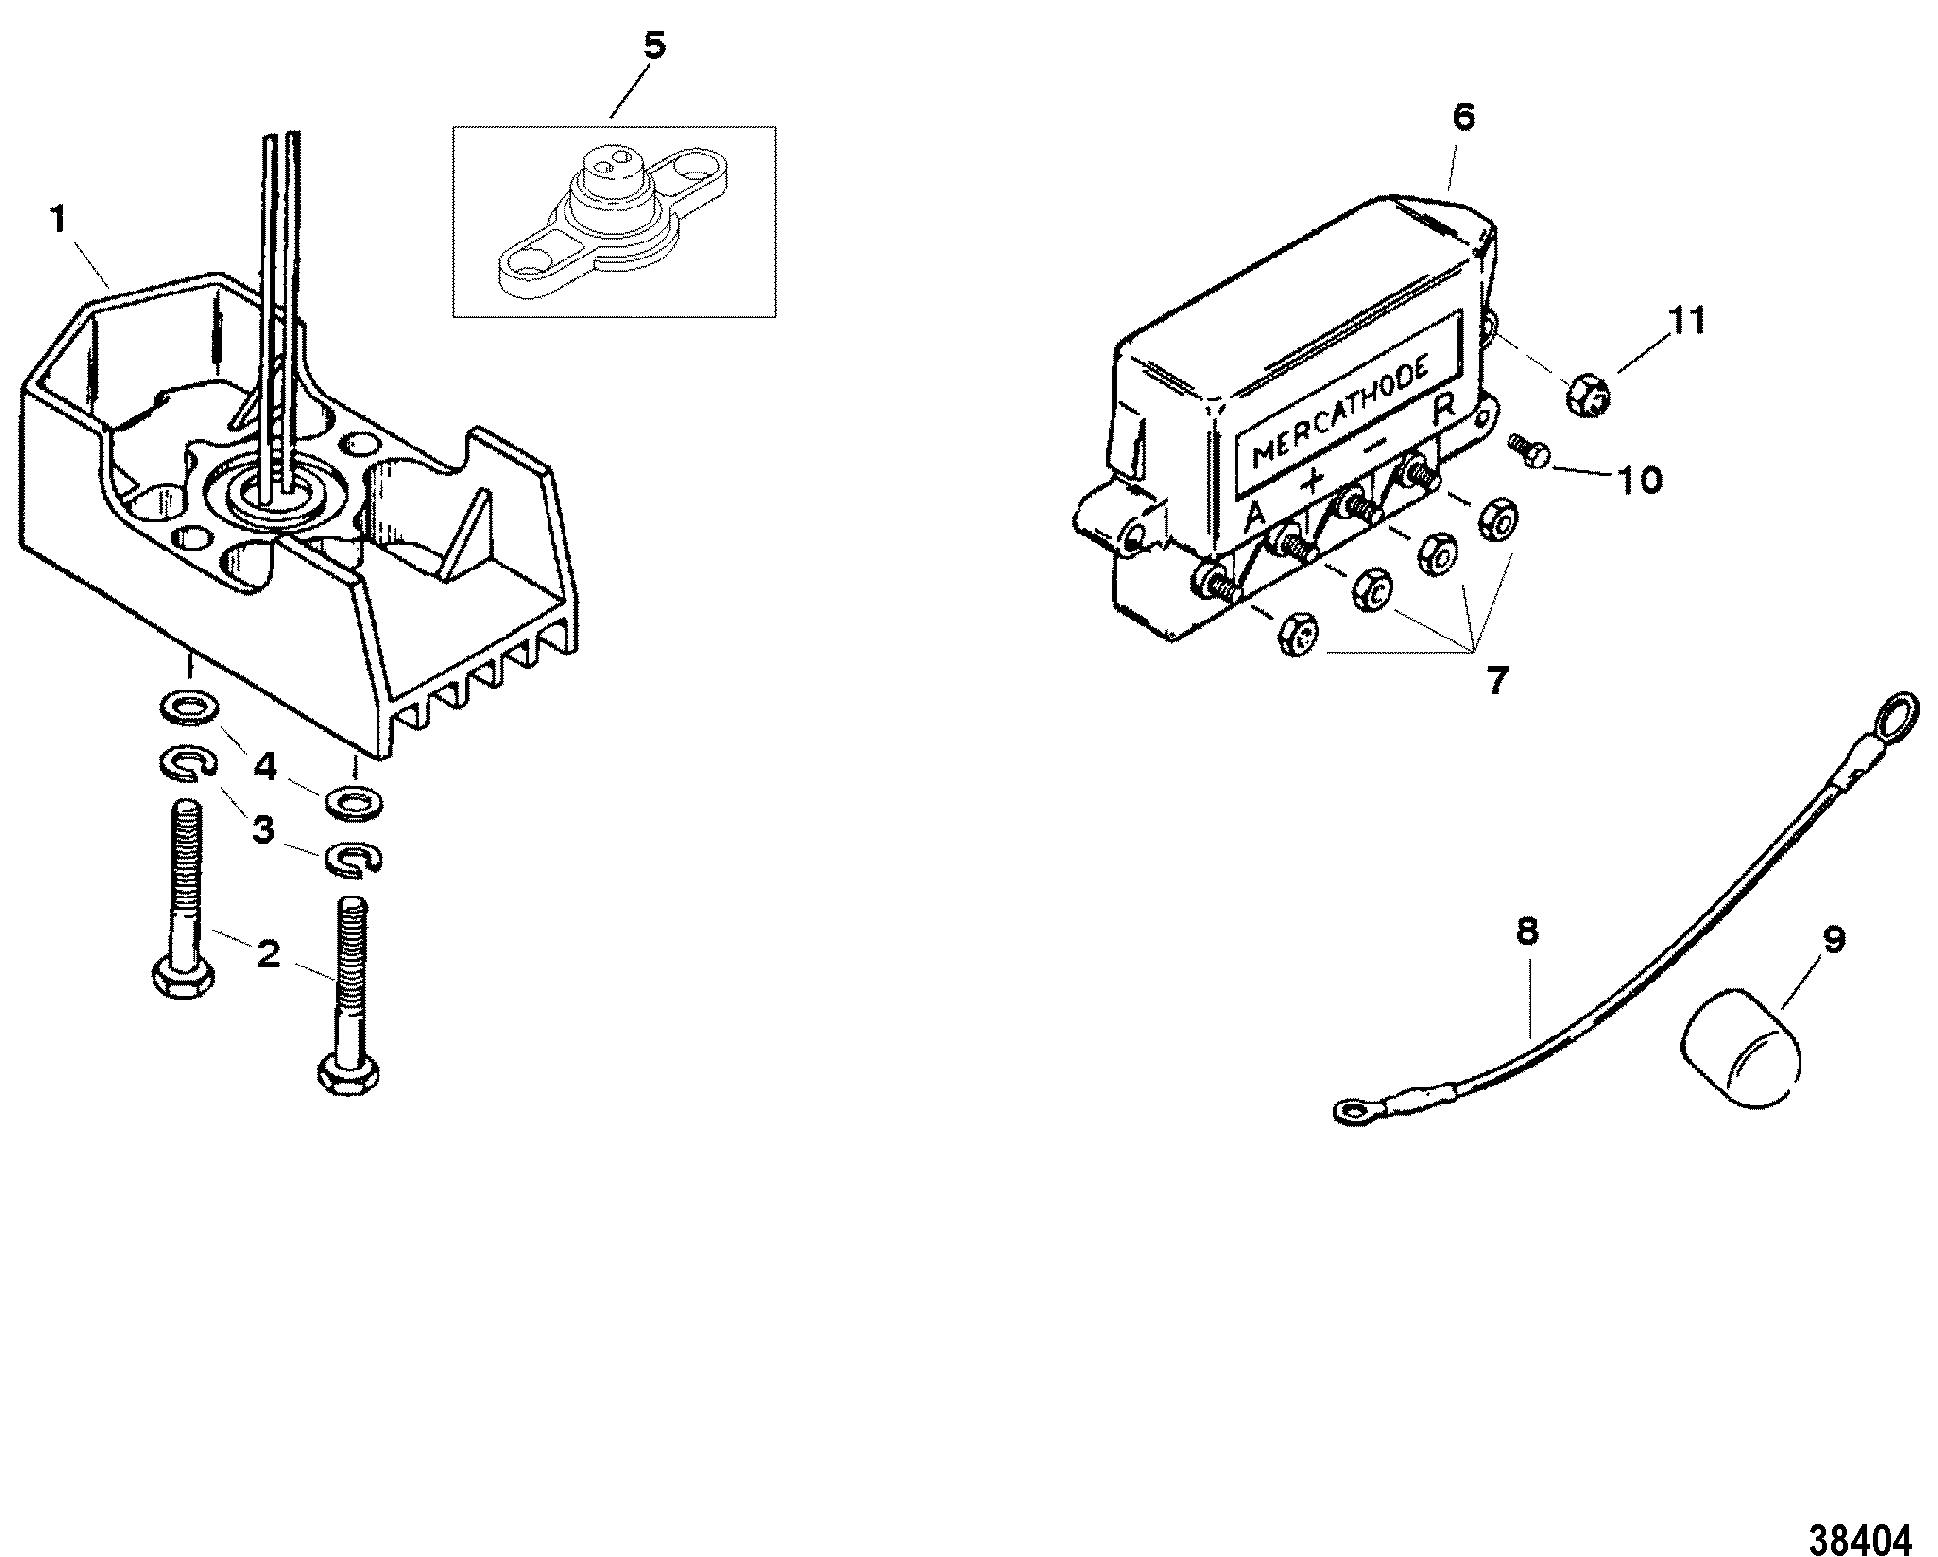 hight resolution of  mercruiser 5 7lx efi 4 bbl tbi gm 350 mercruiser fuel pump wiring diagram coil wiring diagram 1974 mercruiser 888 302